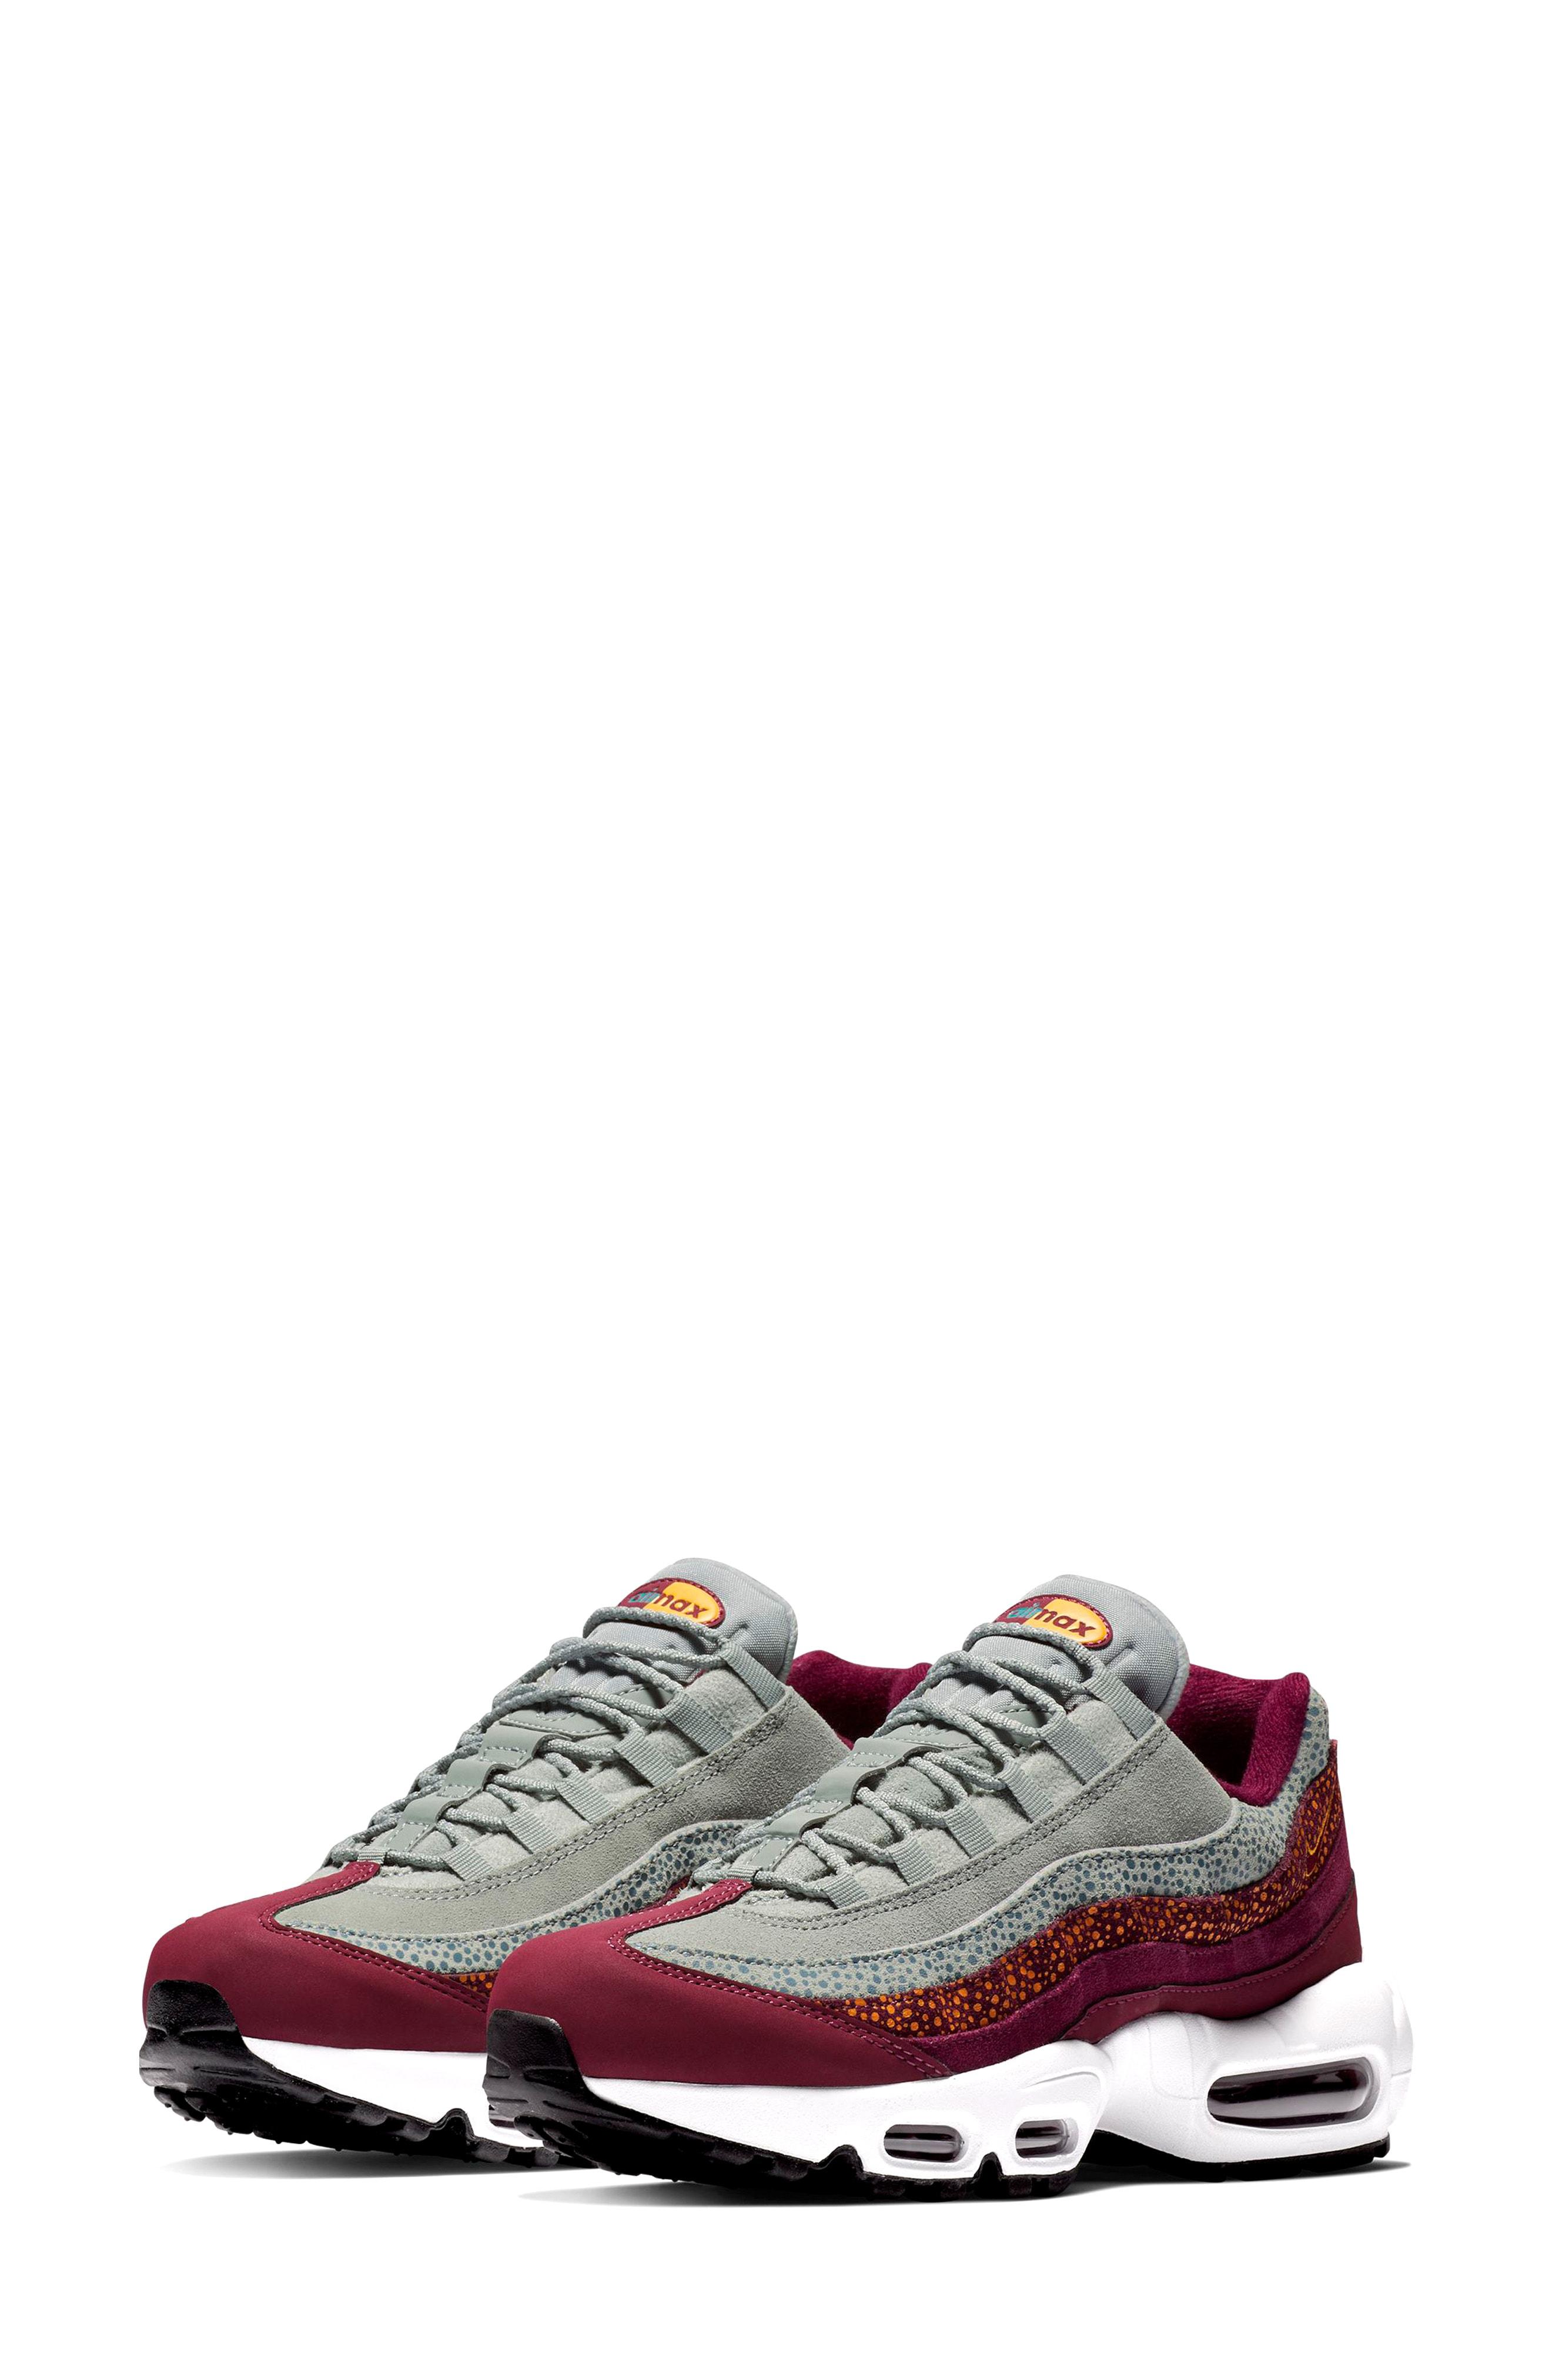 Nike Air Max 95 Premium Sneaker In Bordeaux/ Ochre/ Green/ Black ...